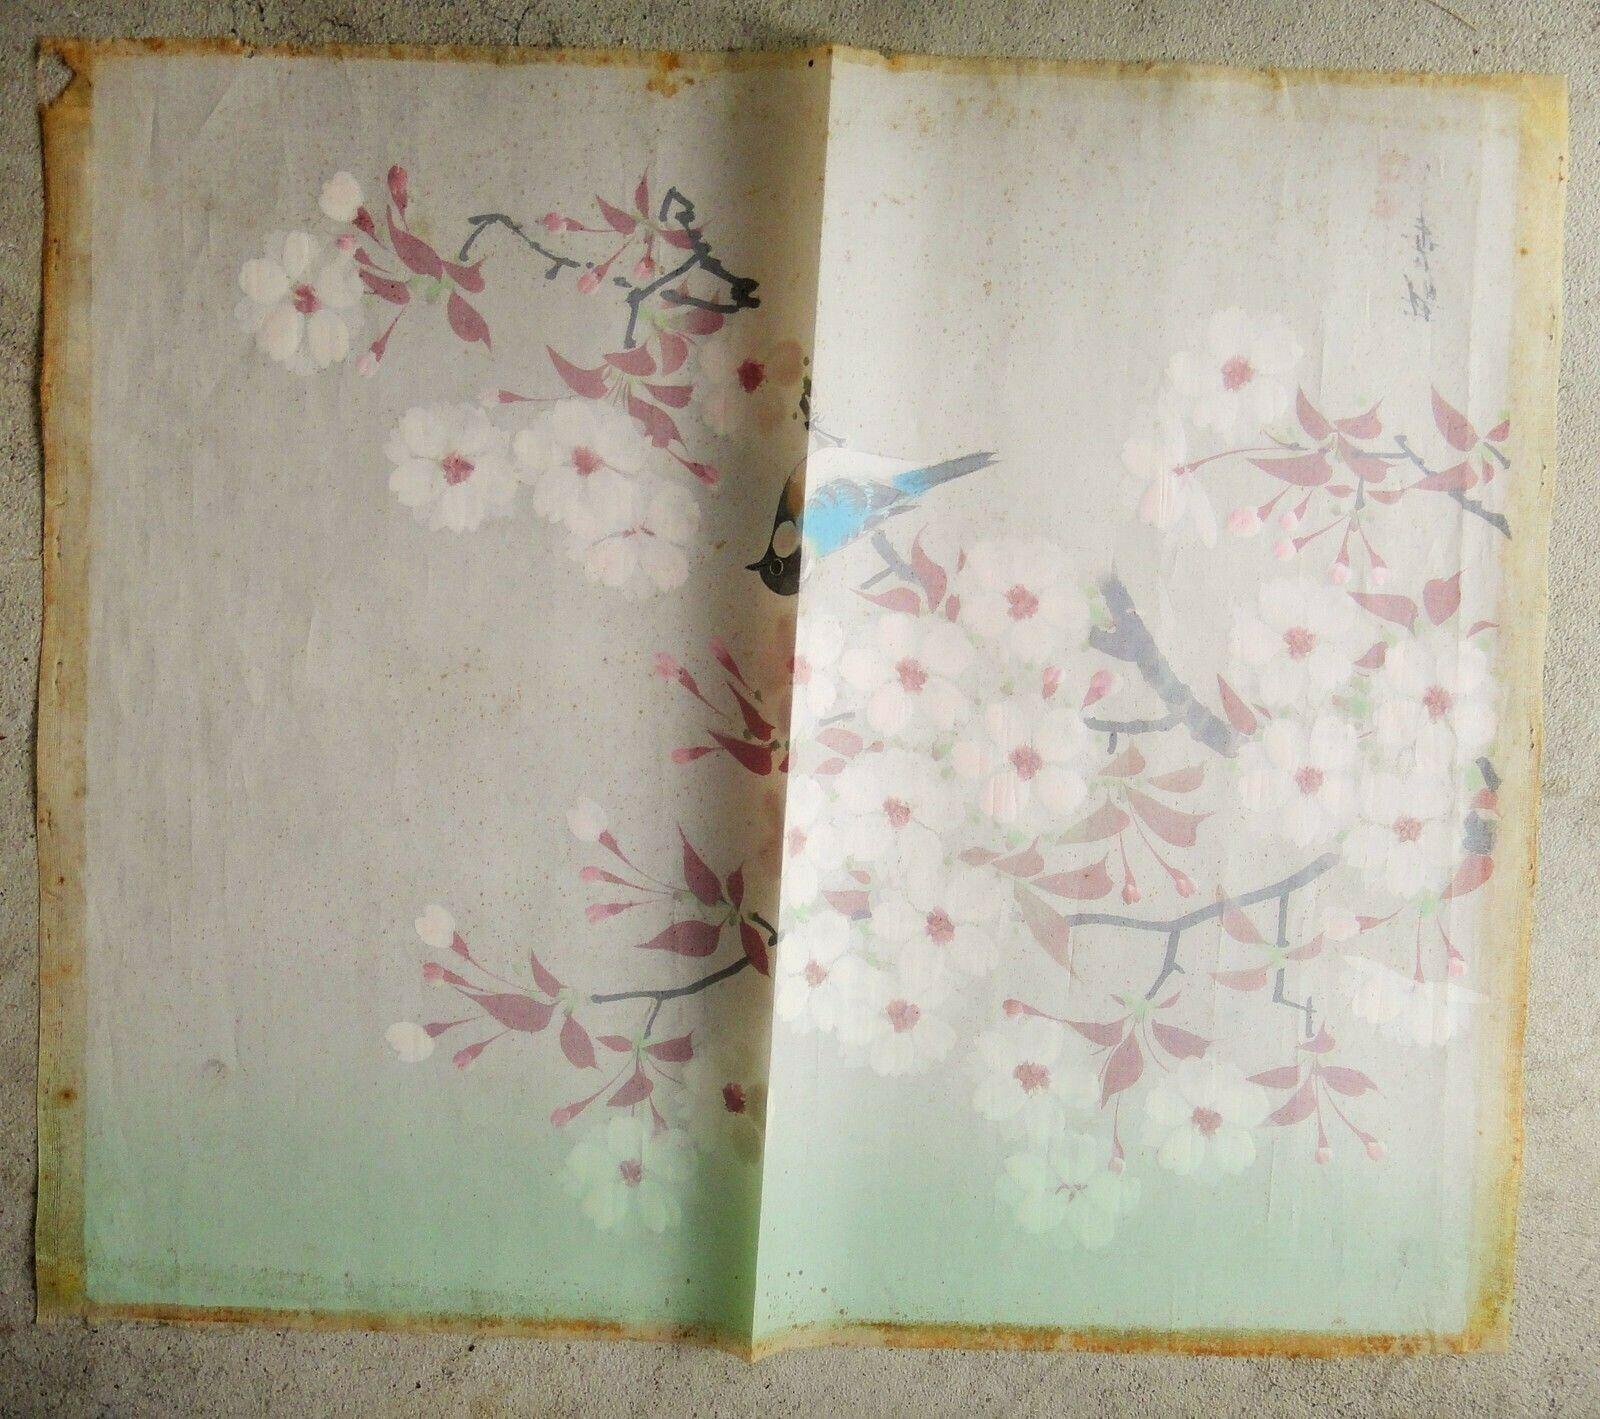 "vintage JAPANES ART SILKSCREEN? PAINTED ART SILK? FABRIC older SIGNED 17.5x14.5"""